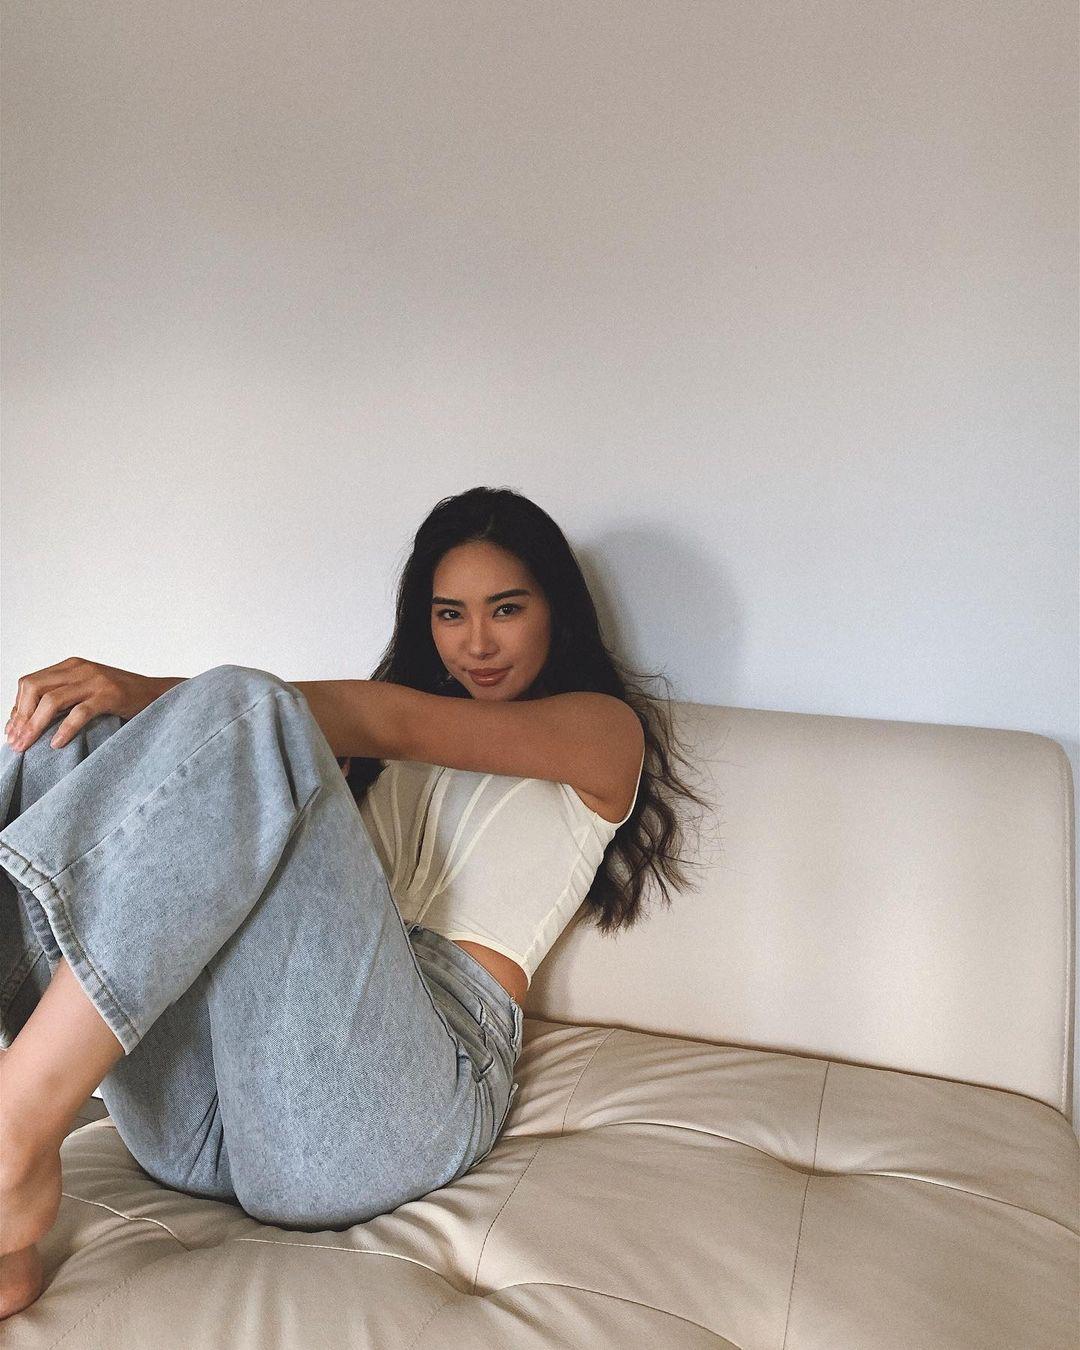 Steph-Ahn-Wallpapers-Insta-Fit-Bio-6